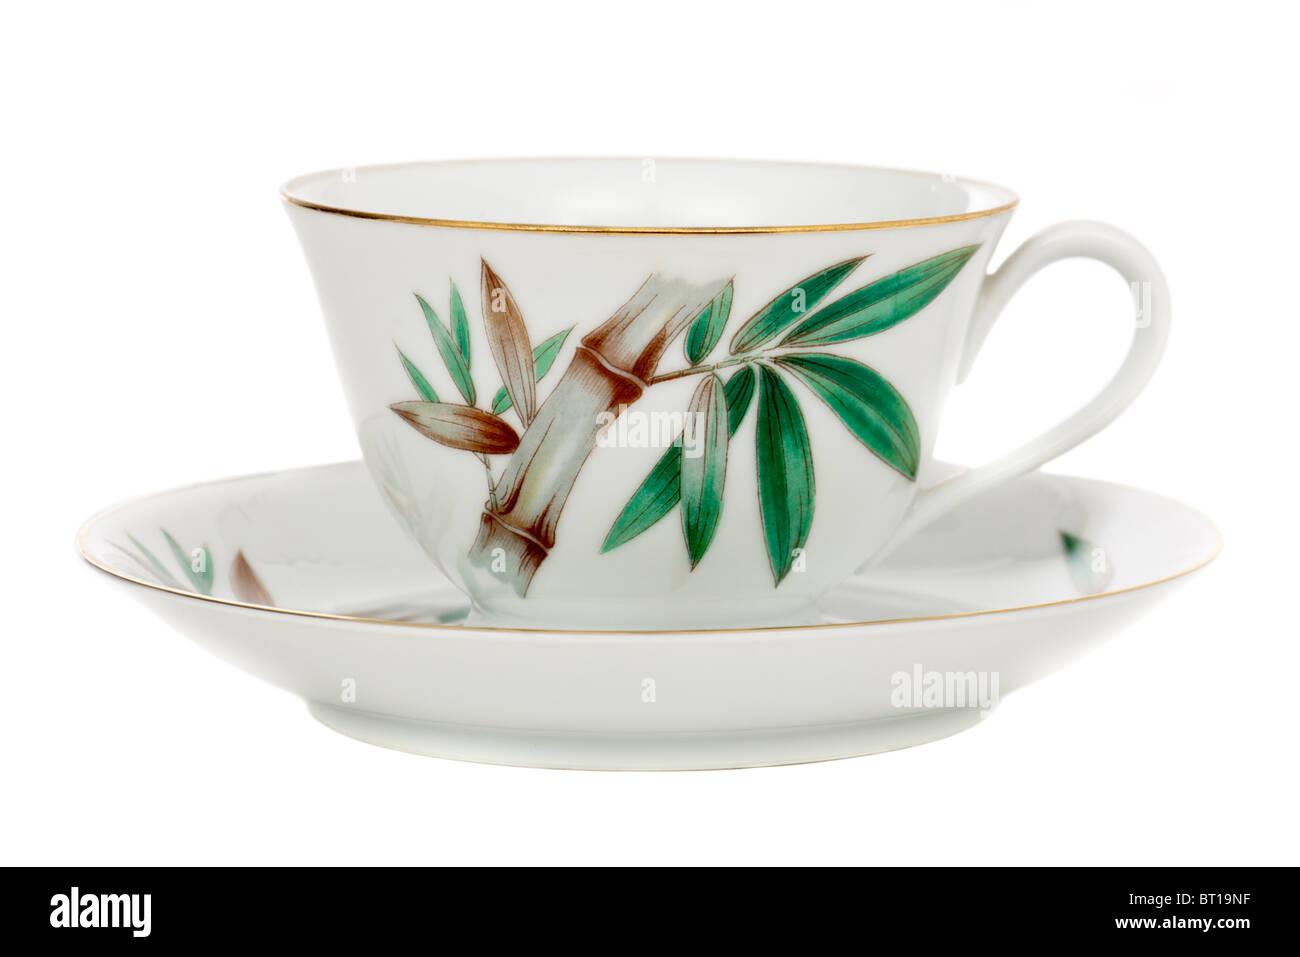 1930's Japanese Noritake RC (Royal Crockery) cup and saucer - Stock Image